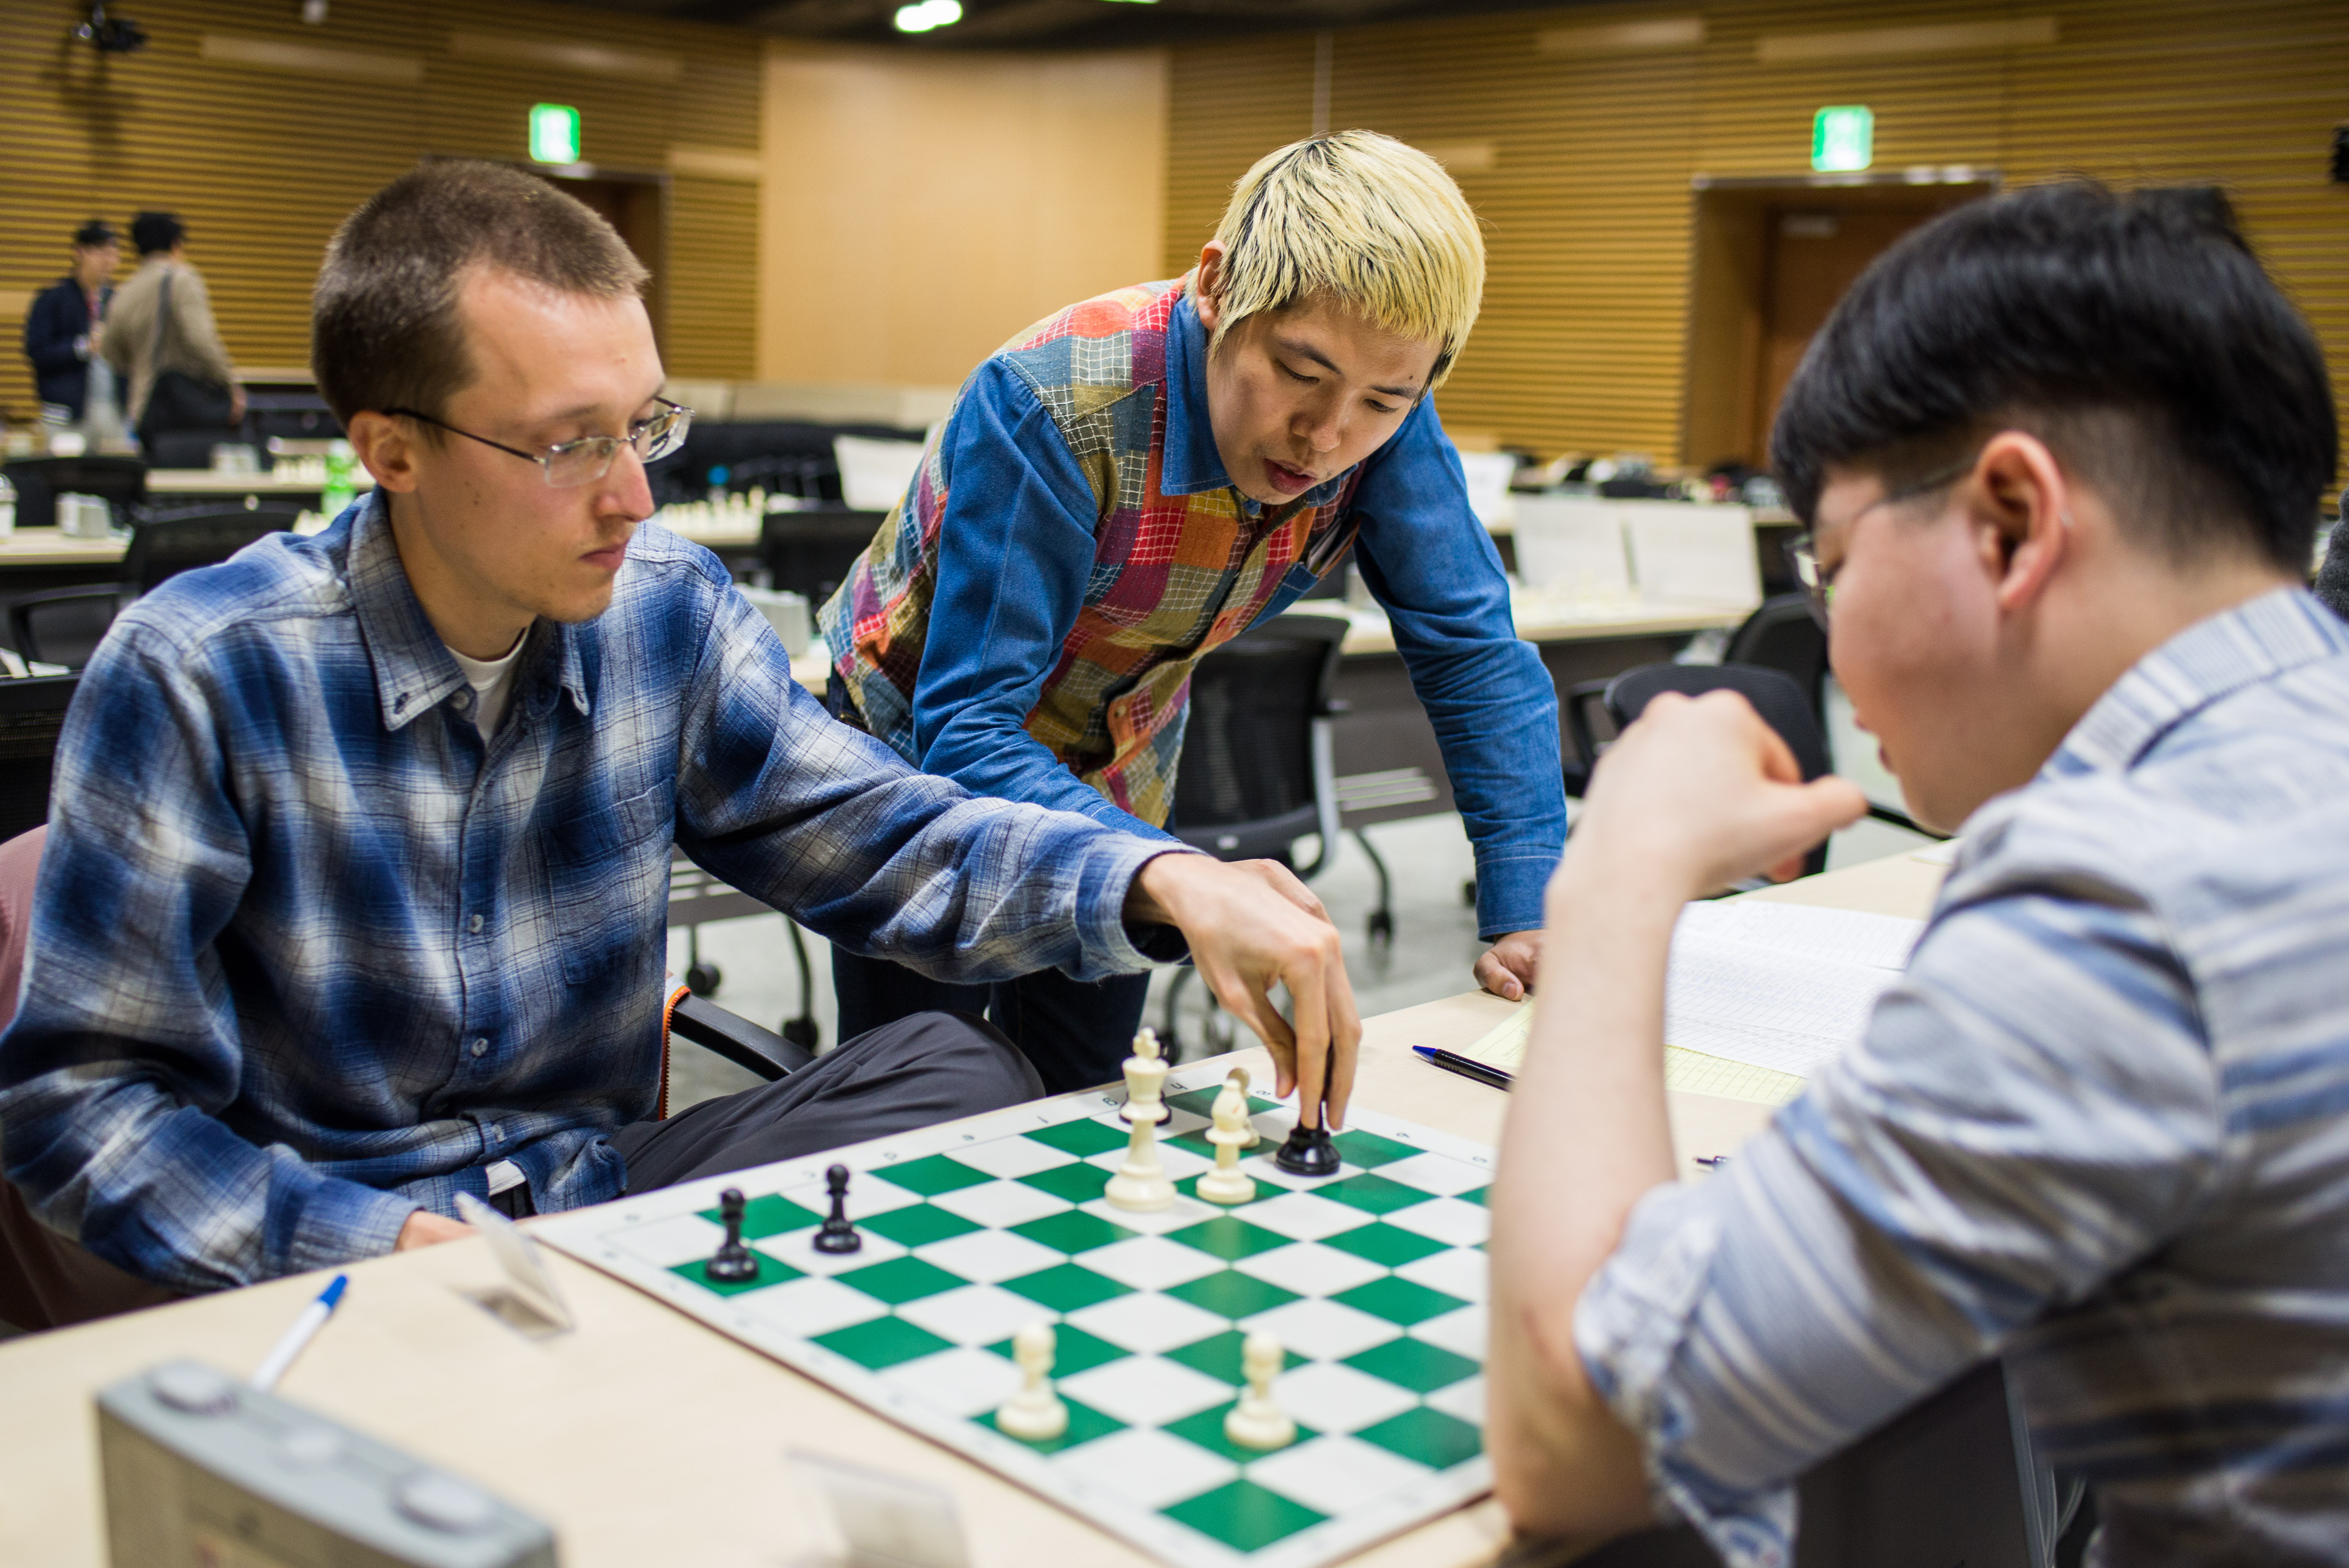 South Korea's Kid Chess Whizzes   The Diplomat